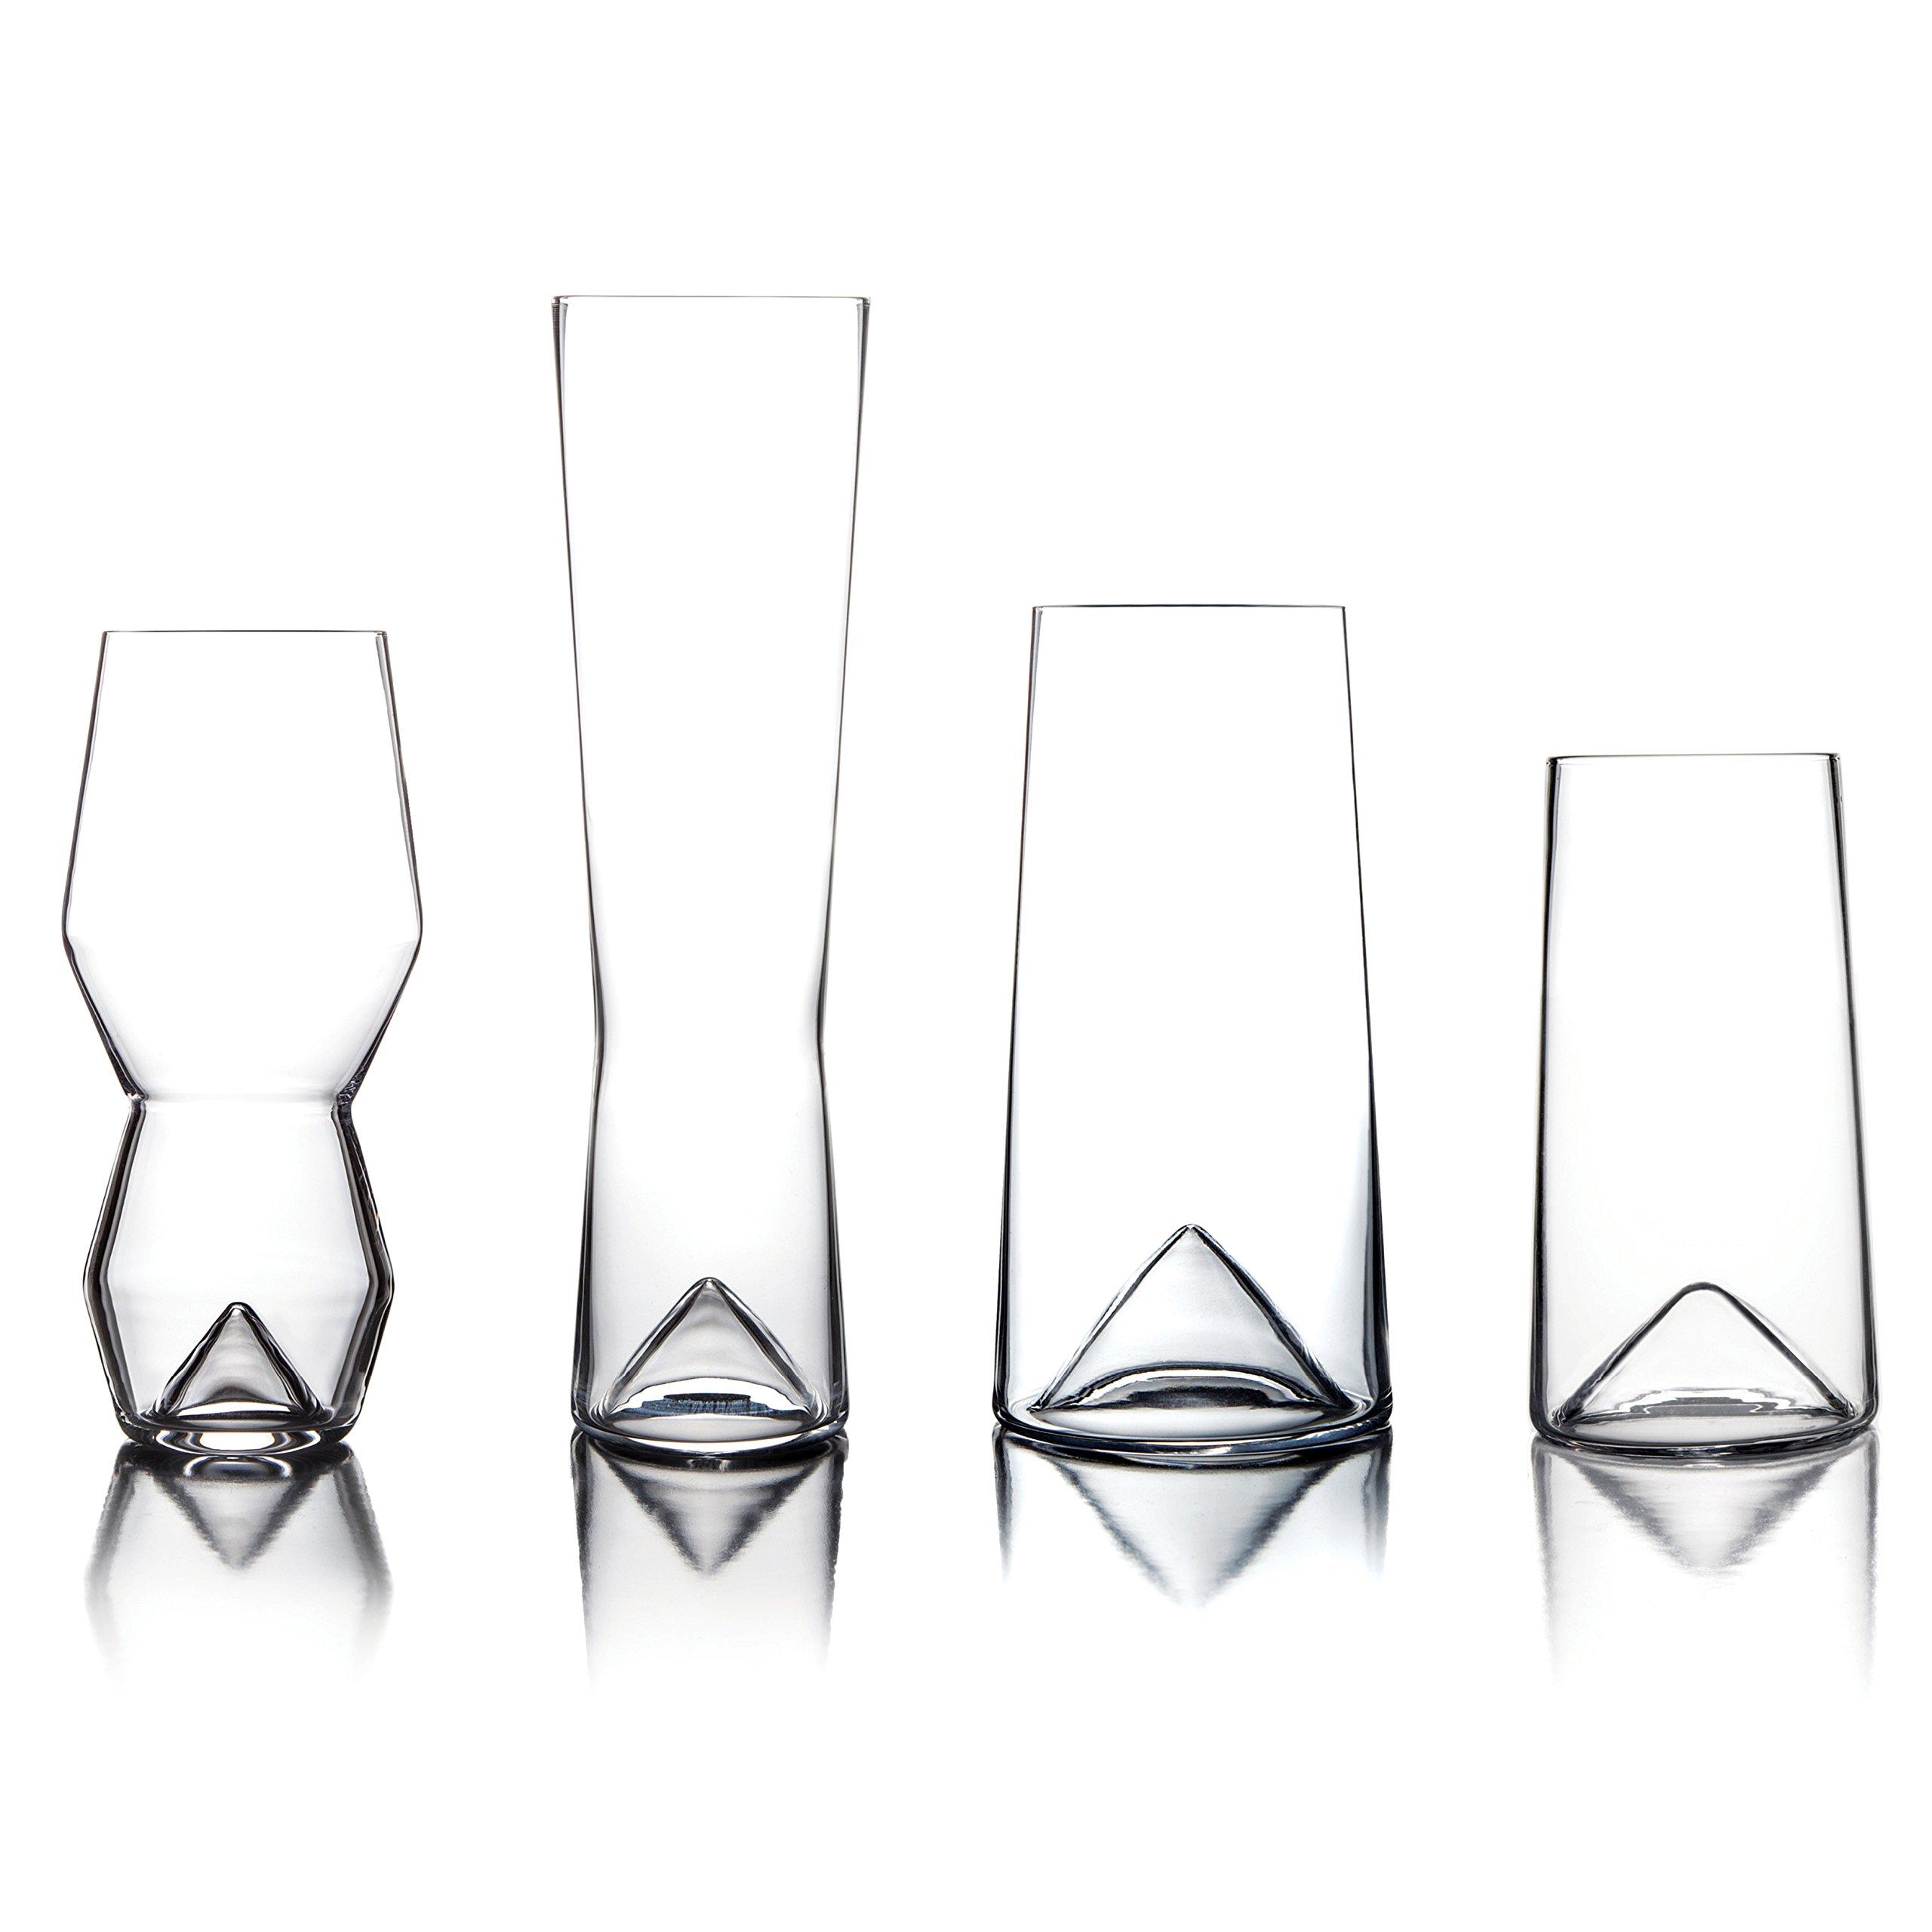 Sempli Monti-Taste Beer Glasses, Set of 4 in Gift Box by Sempli (Image #2)